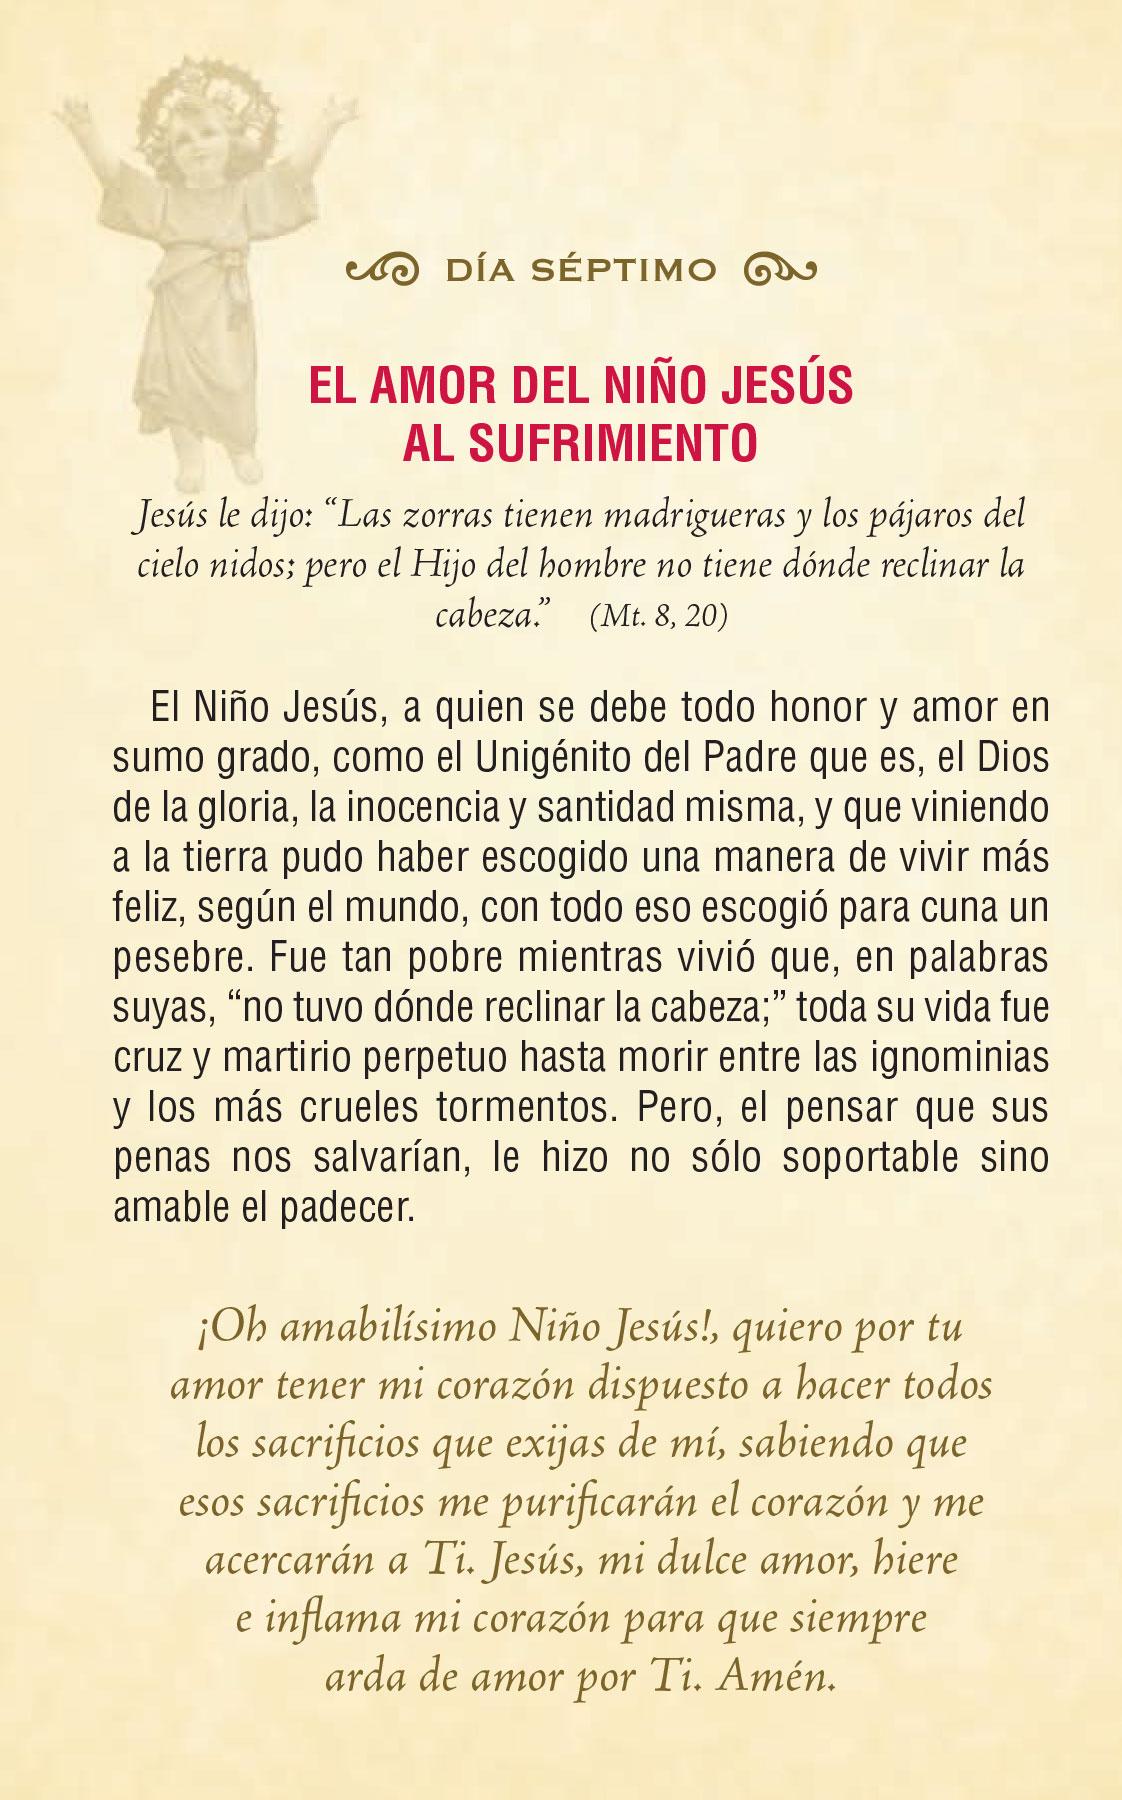 Divinio Niño Jesús - día séptimo